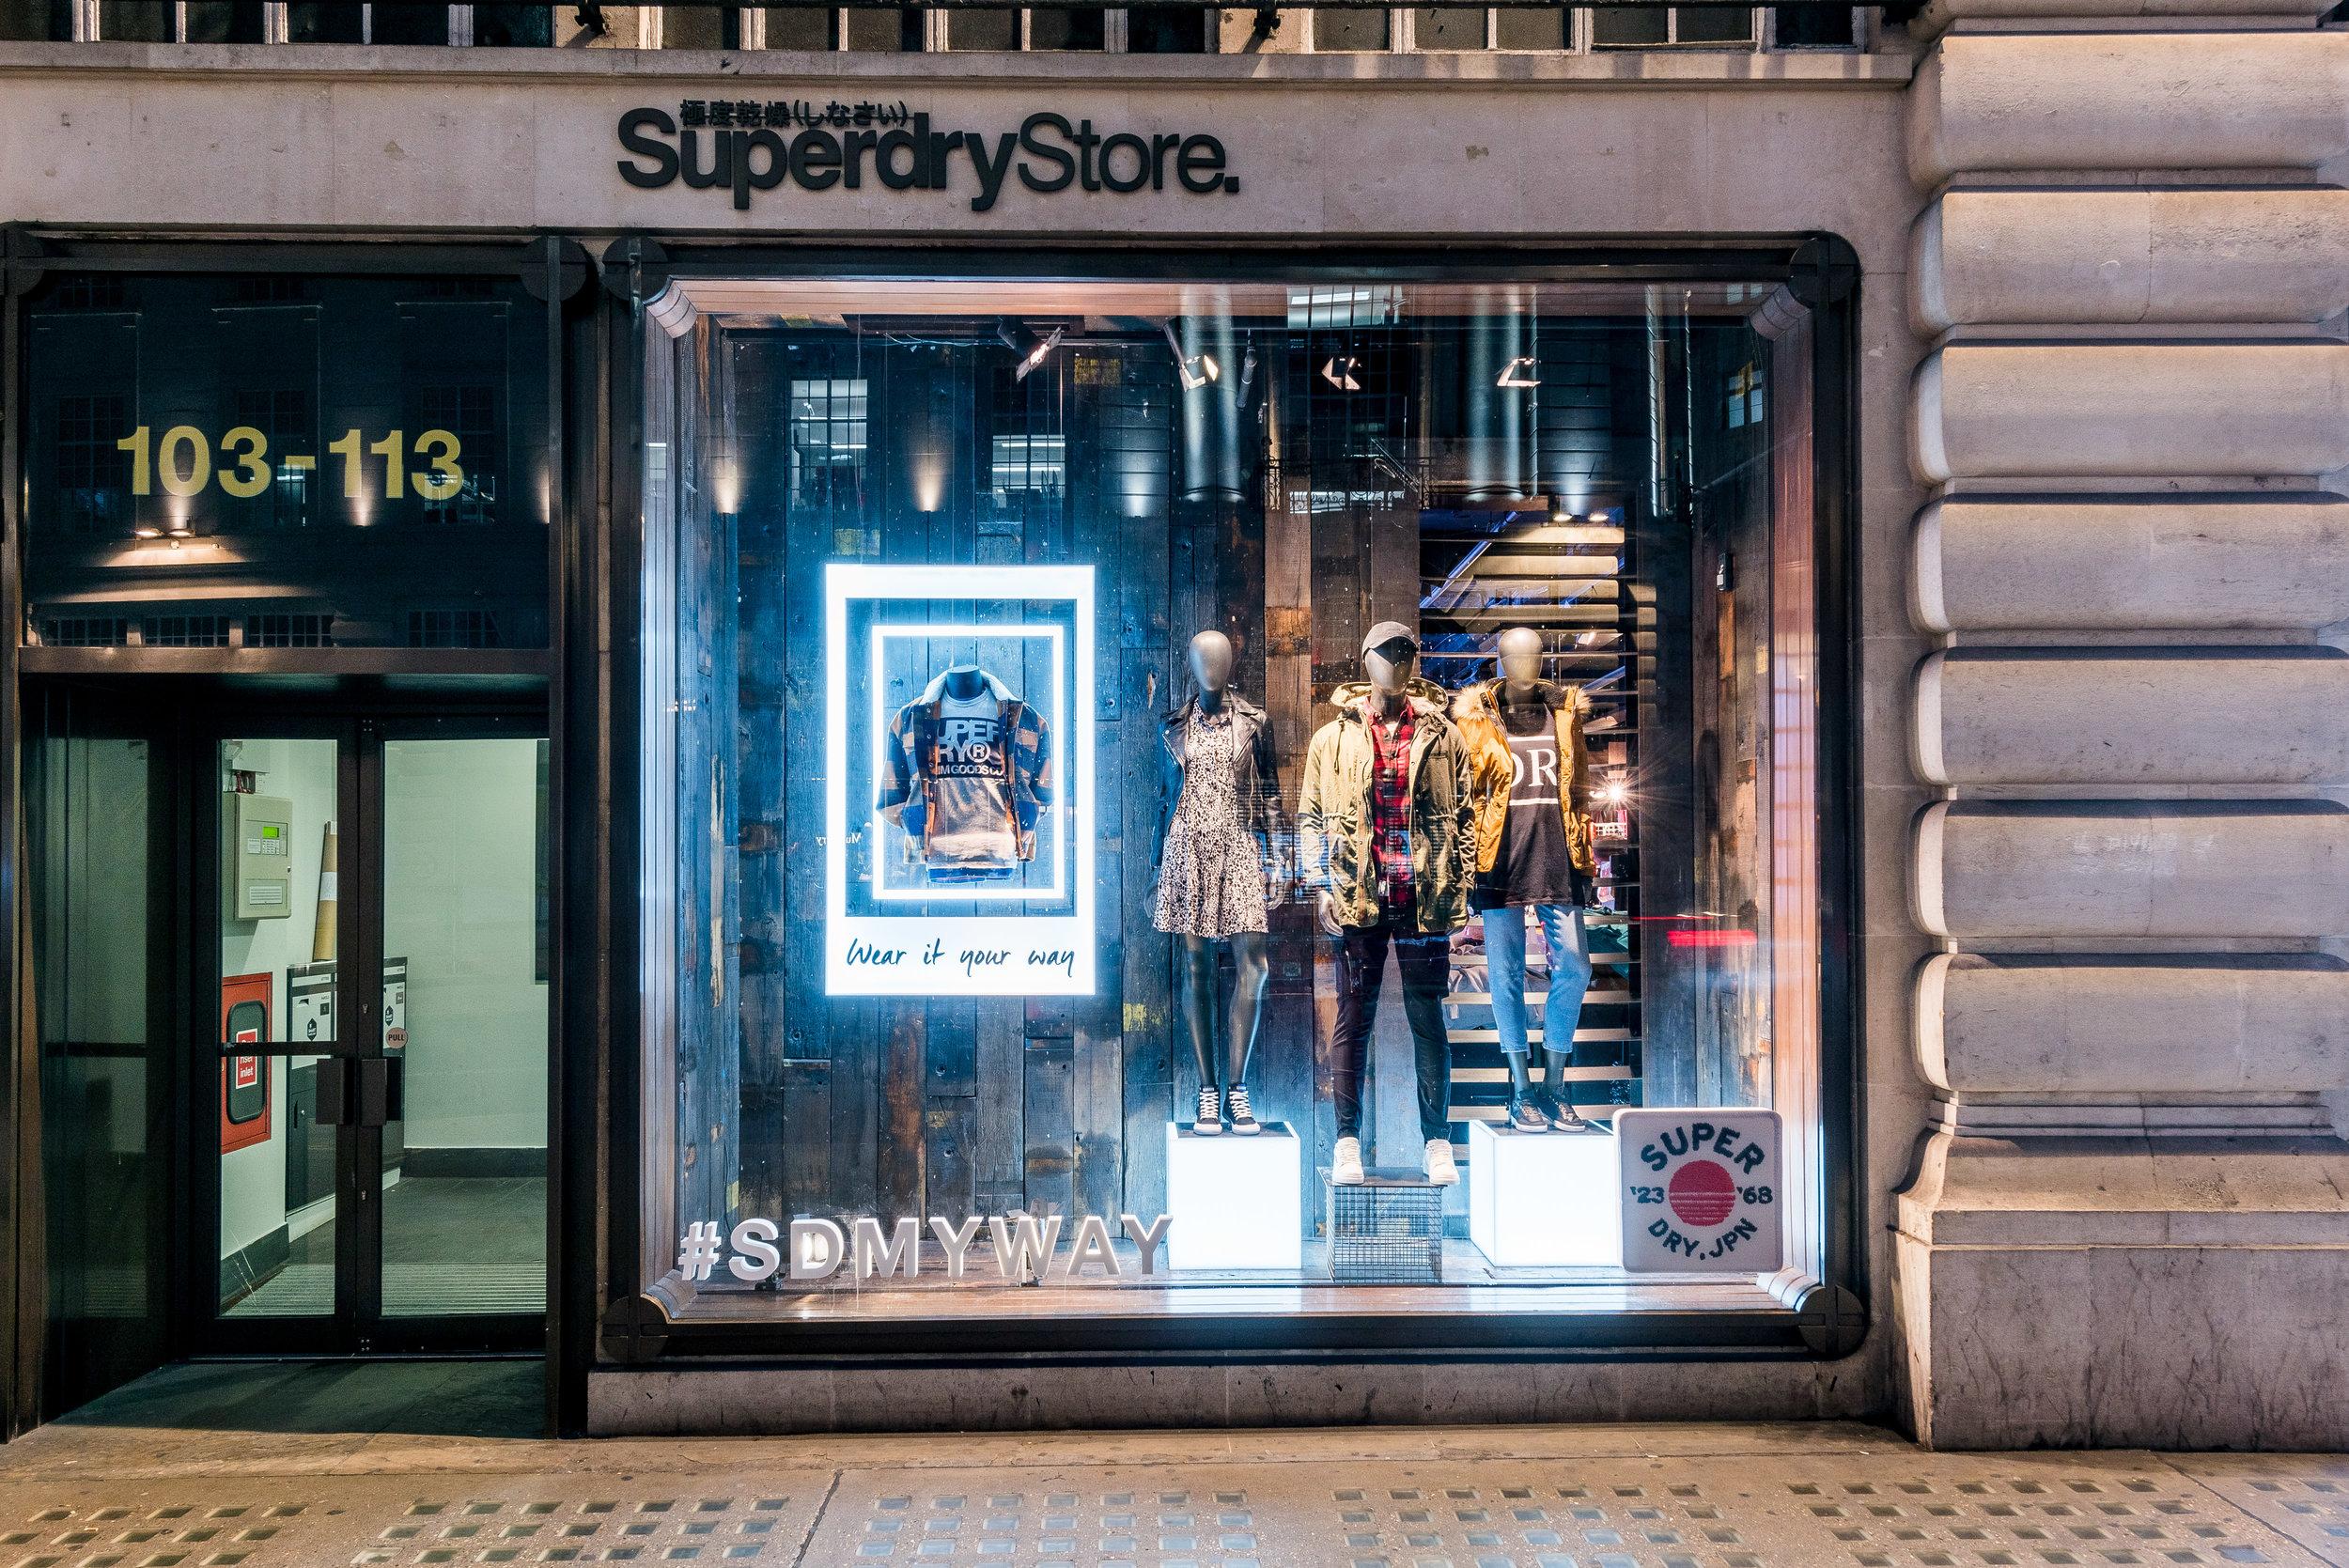 KGK_SuperdryStore_RegentSt_05.09.19-08.jpg